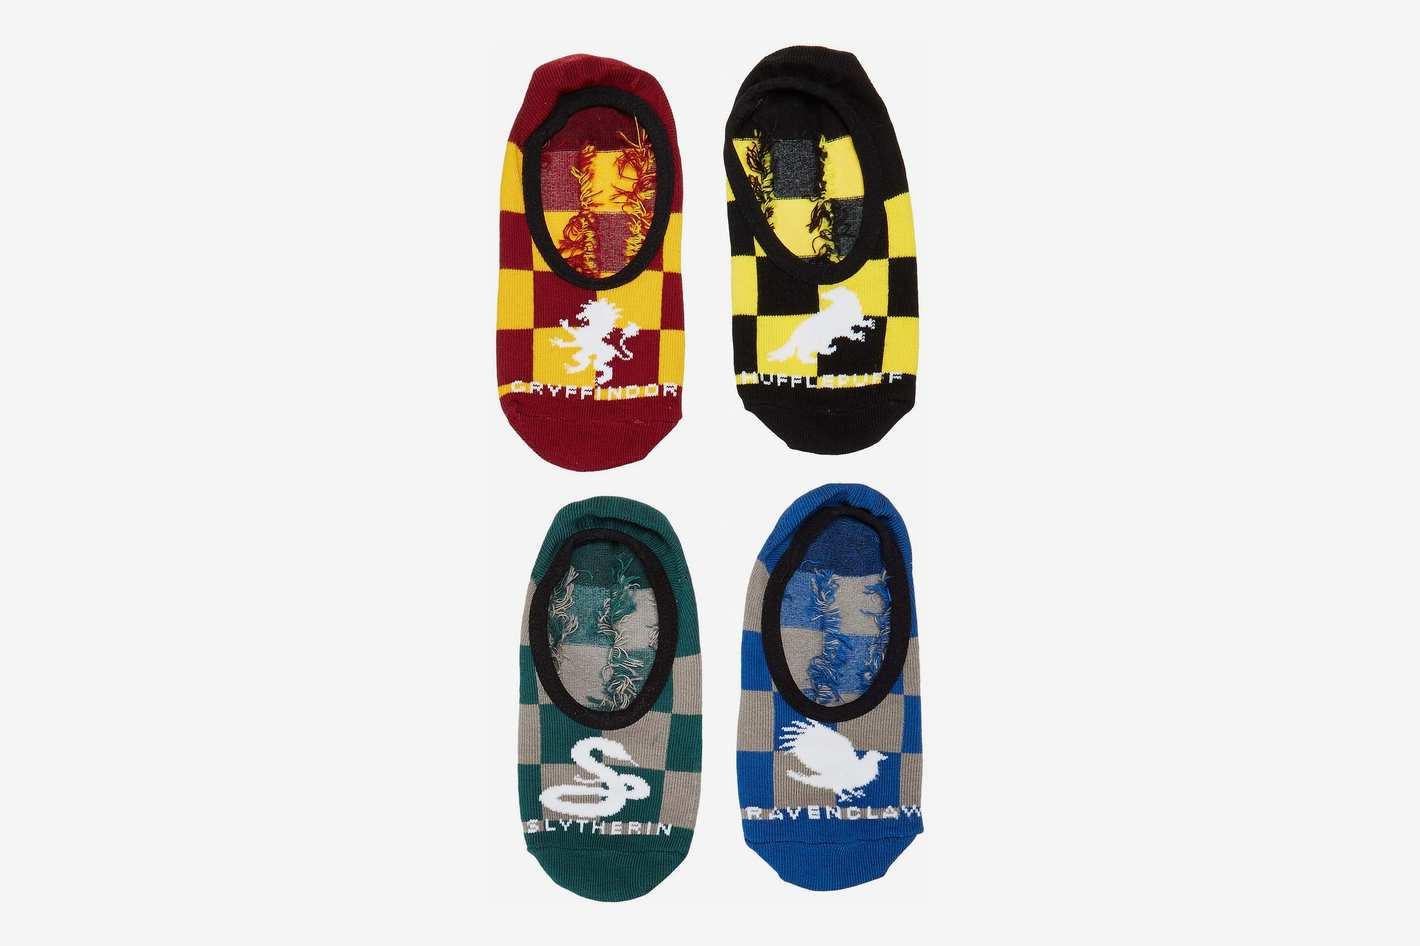 Vans X Harry Potter Hogwarts Canoodle 4-Pack